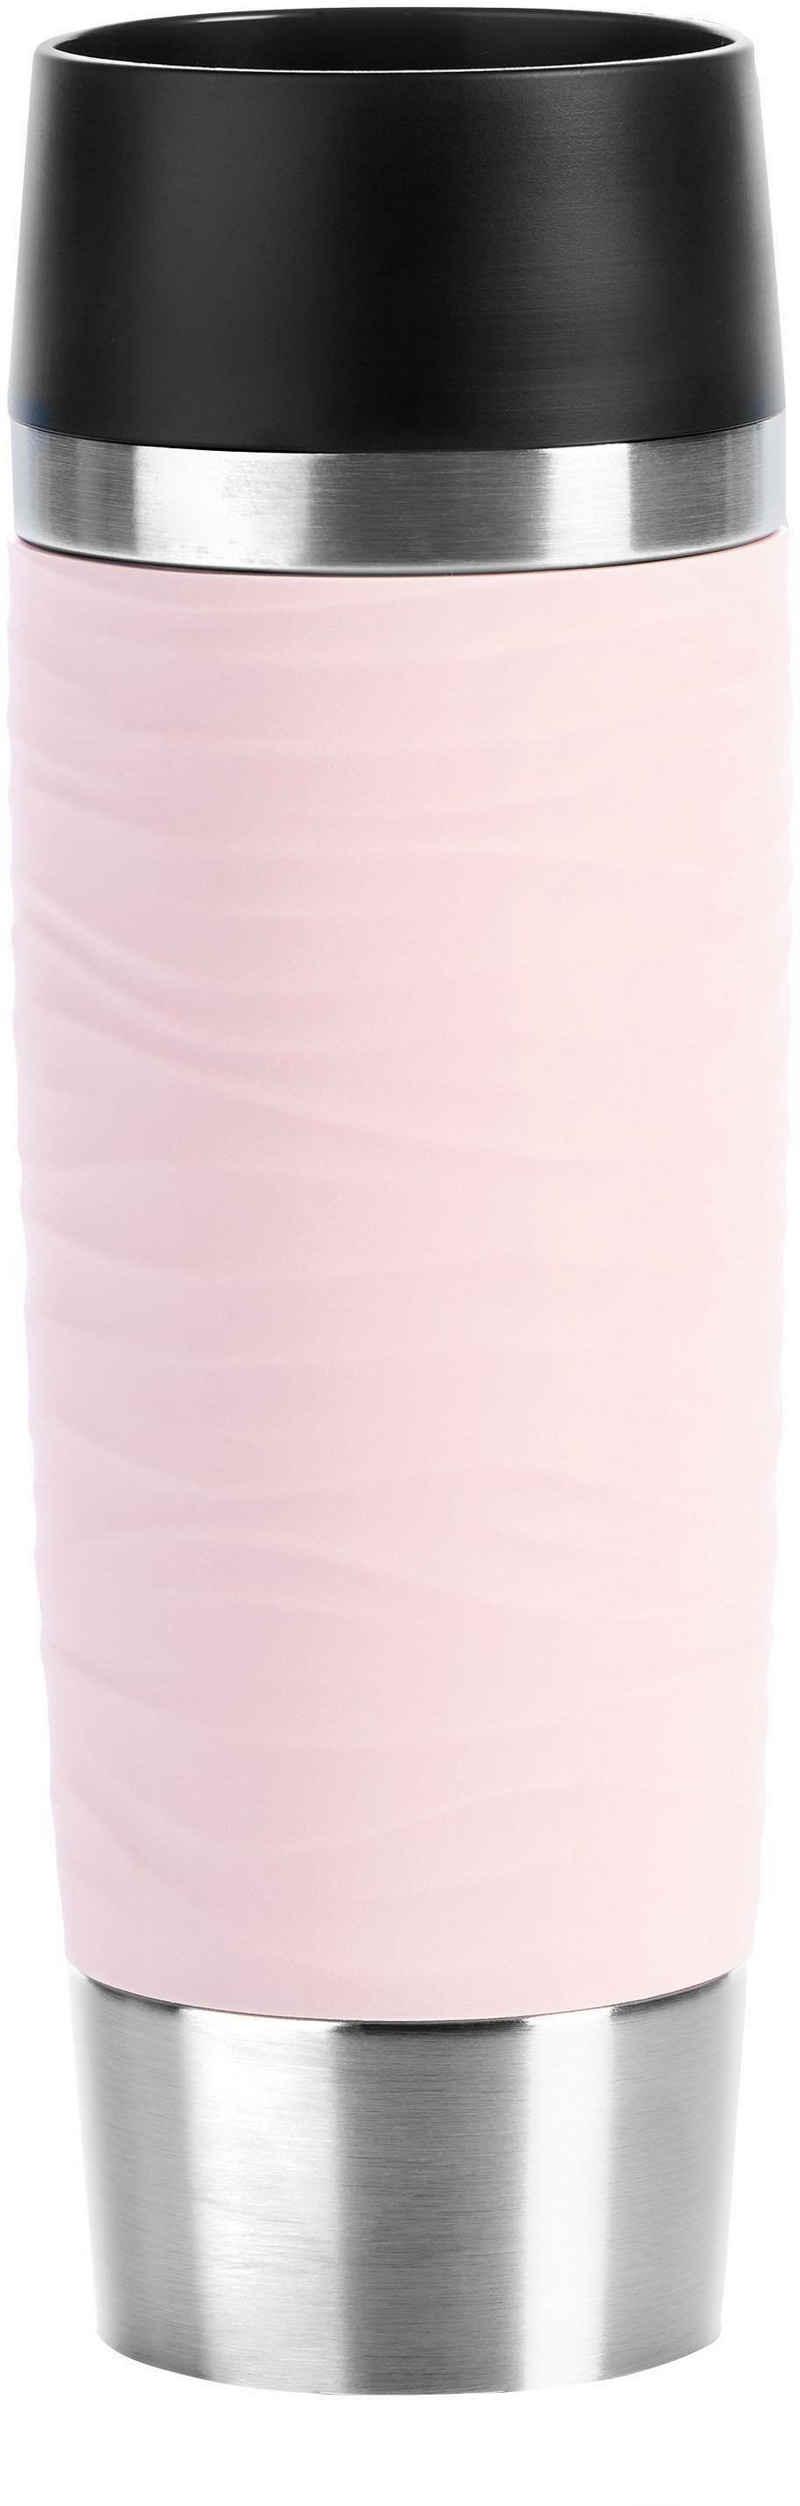 Emsa Thermobecher »Travel Mug Waves Grande«, Edelstahl, Edelstahl, 500 ml Inhalt, auslaufsicher, 6h heiß, 12h kalt, doppelwandig, spülmaschinenfest